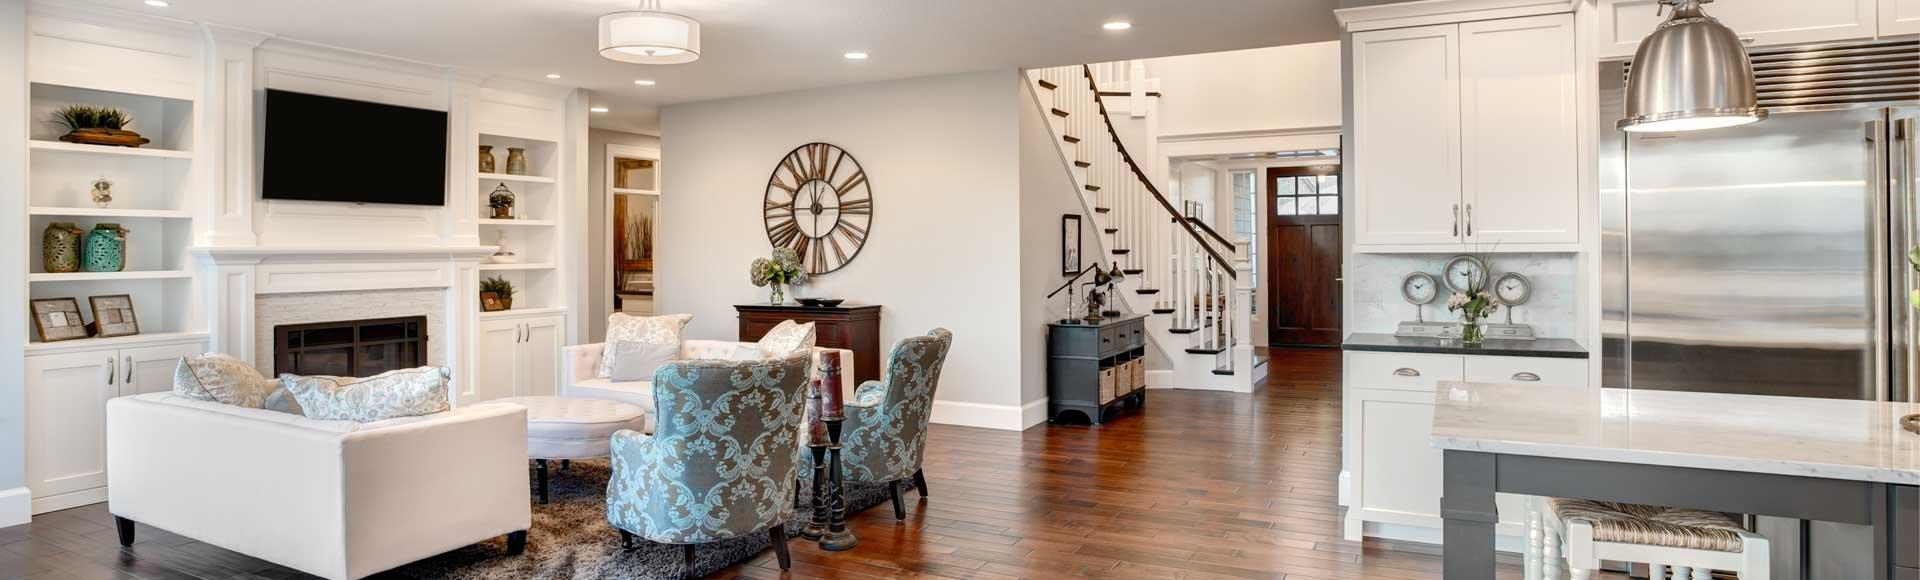 CYCT-Kitchen-Living-Room-Stairway-Scene_1920x580